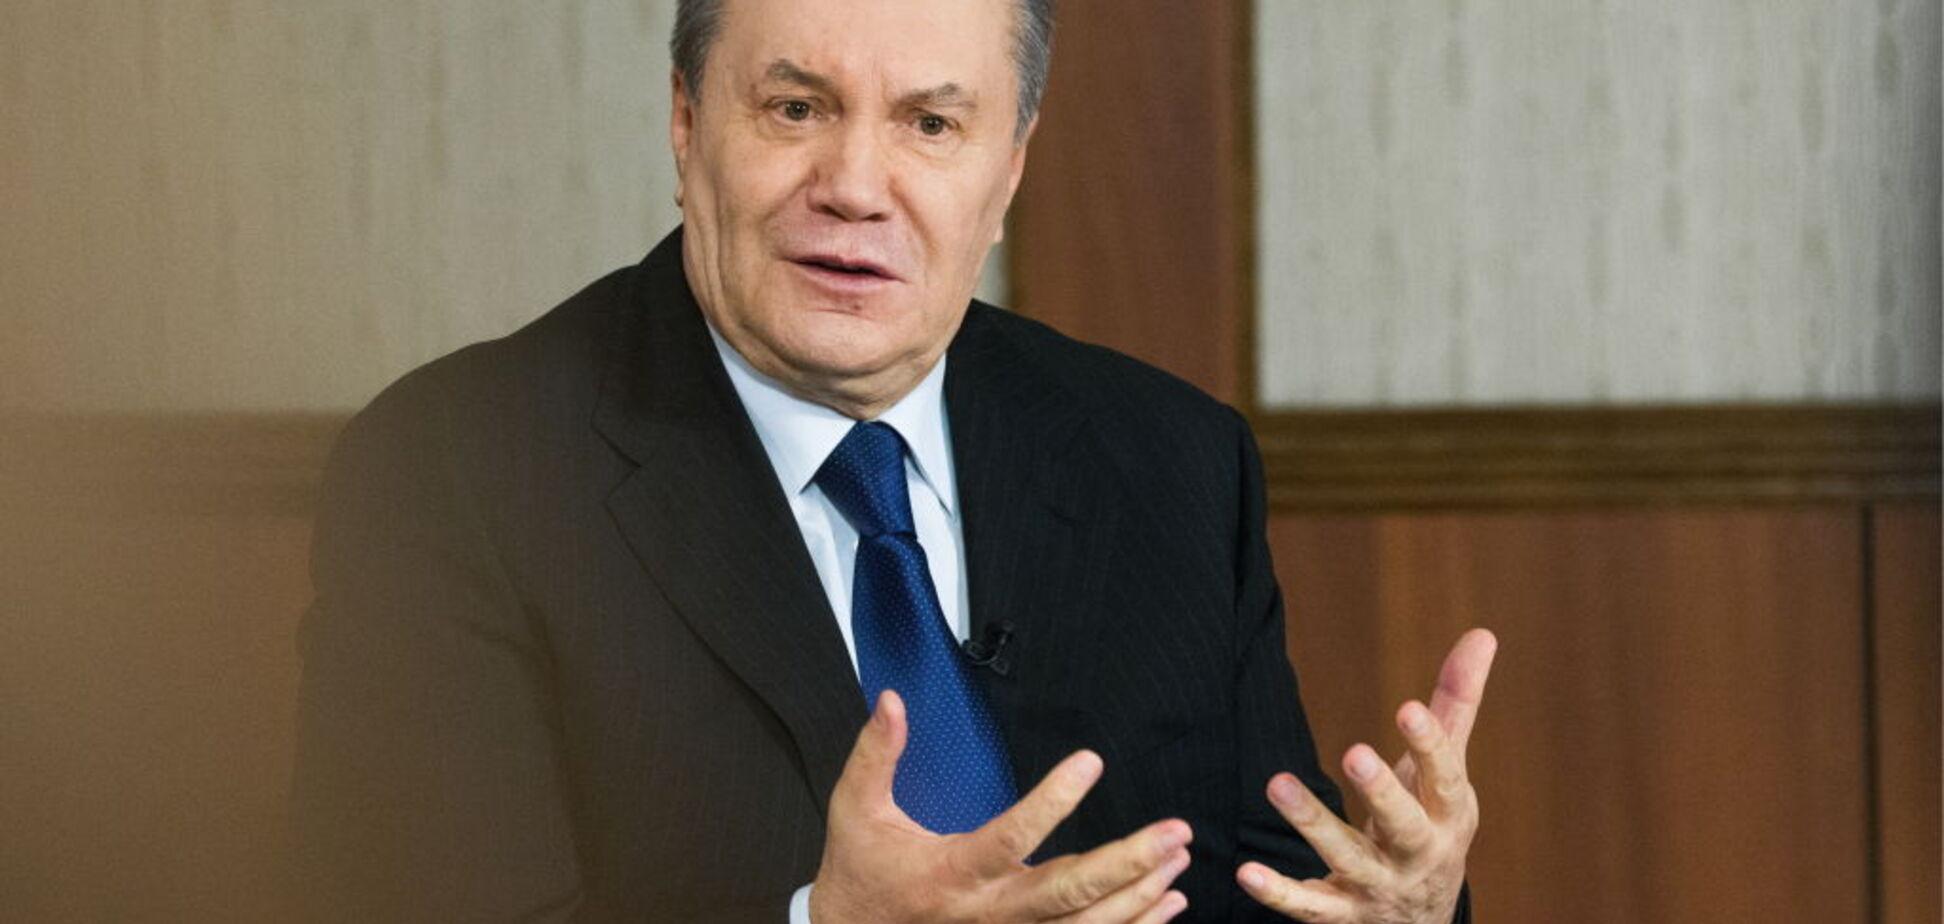 Узурпация власти: ГПУ объявила о подозрении Януковичу и Лавриновичу